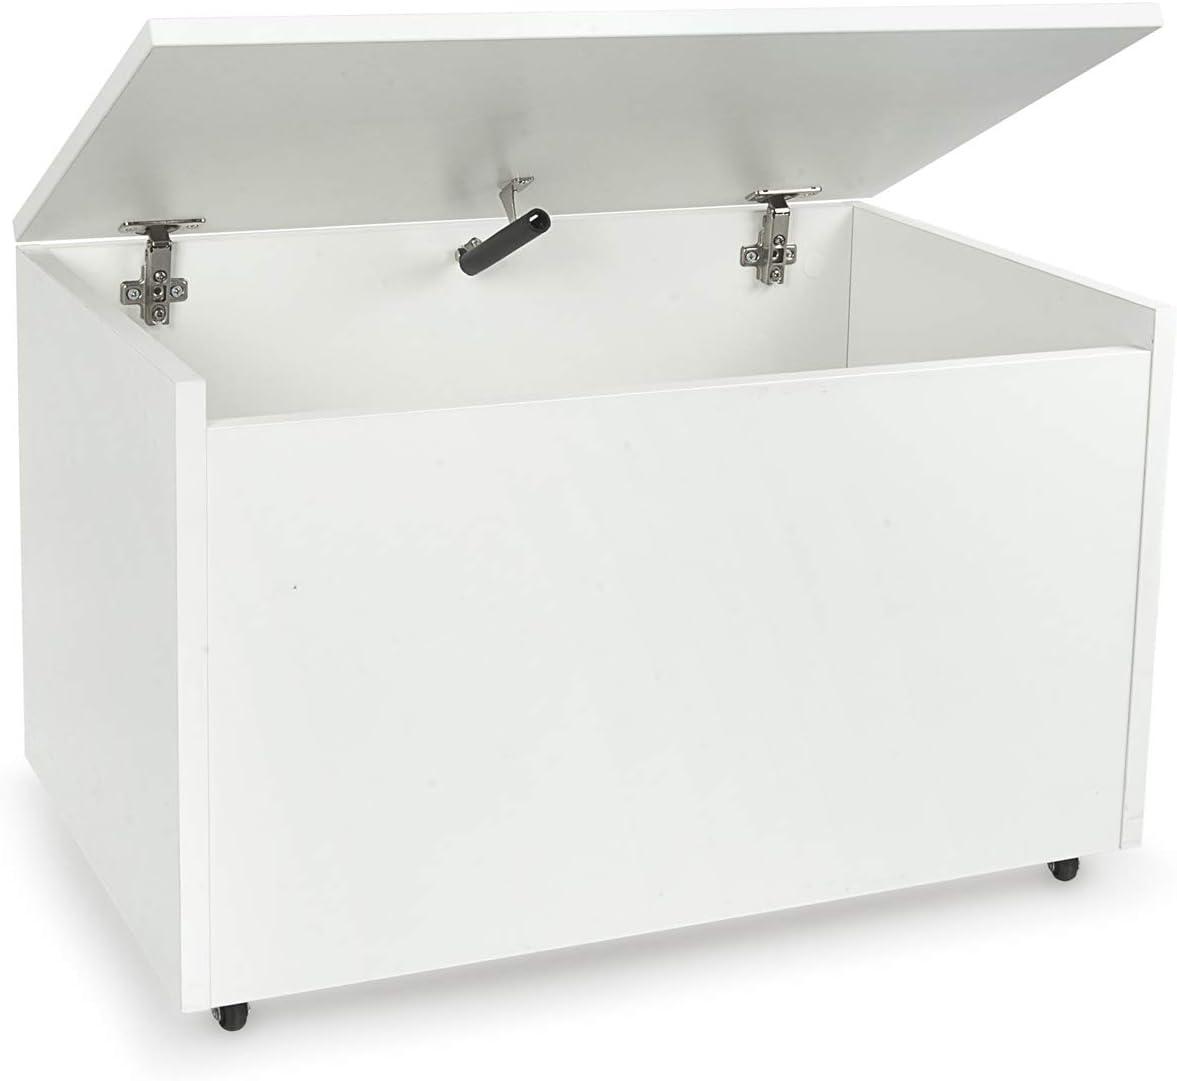 LEOMARK Caja de madera banco XXL con almacenamiento para juguetes, accesorios Baúl de juguetes sobre ruedas, blanco